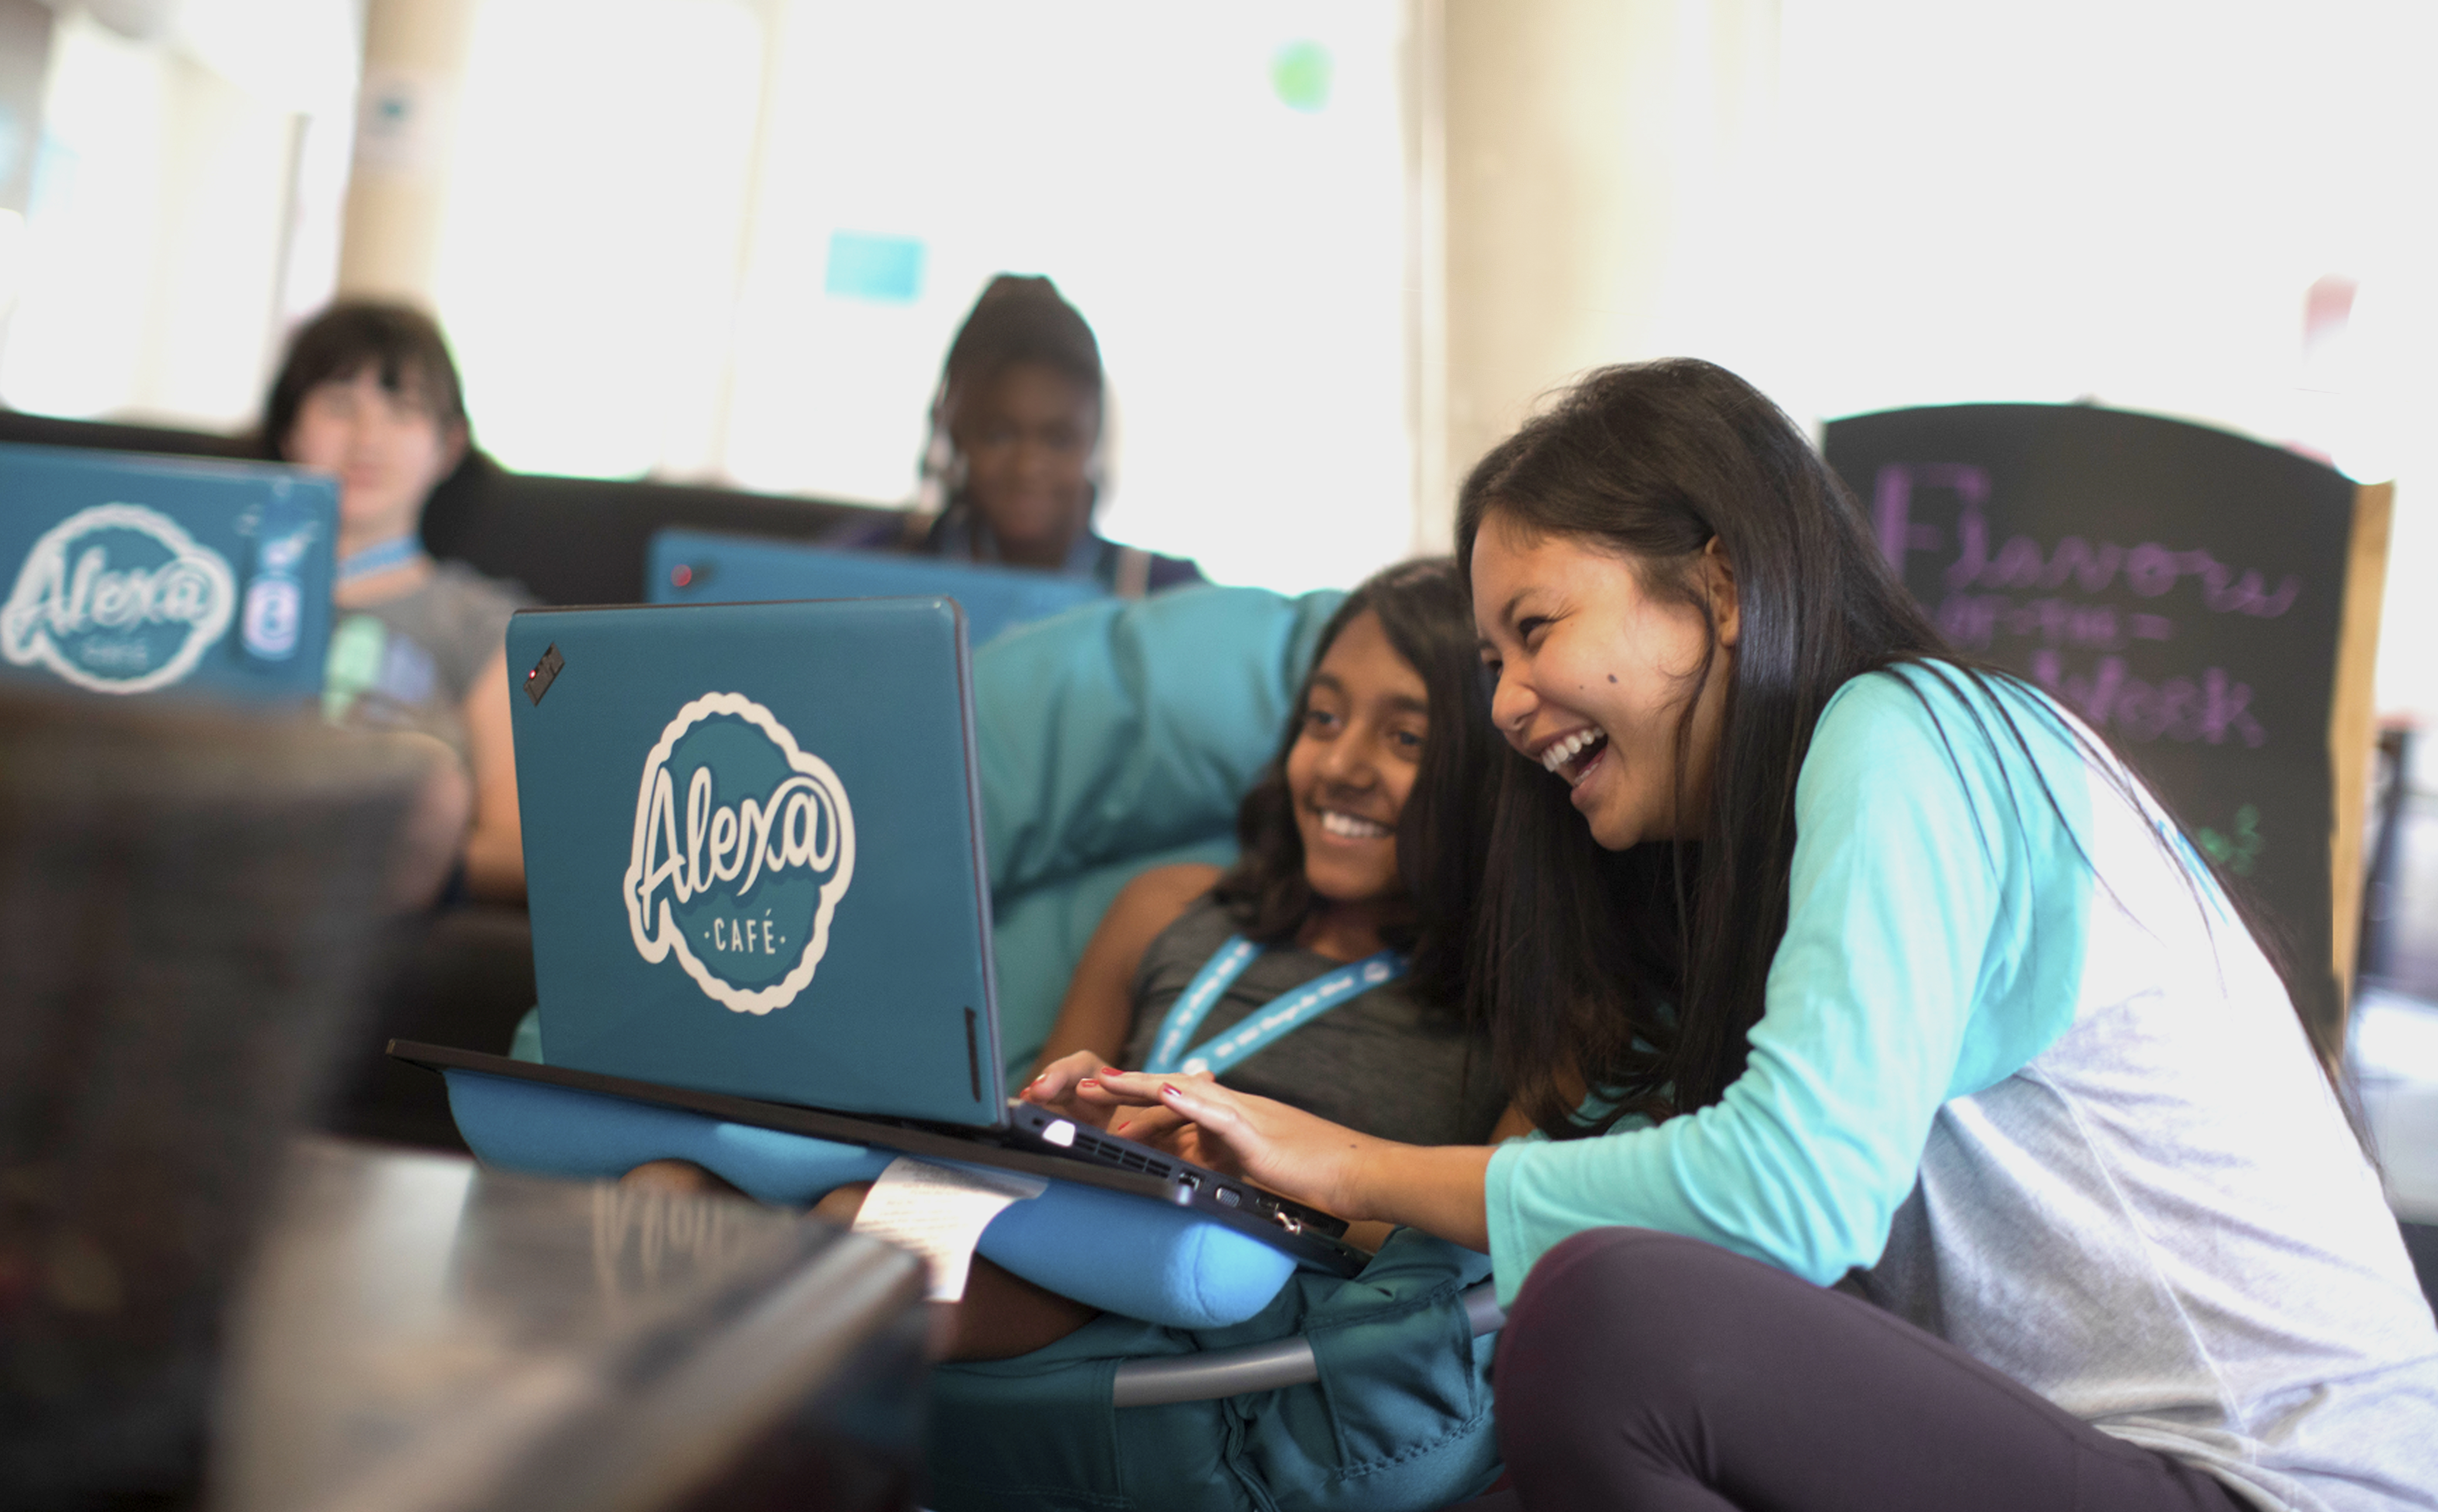 Summer Program - Computer Science | Alexa Cafe: All-Girls STEM Camp | Held at Macalester College